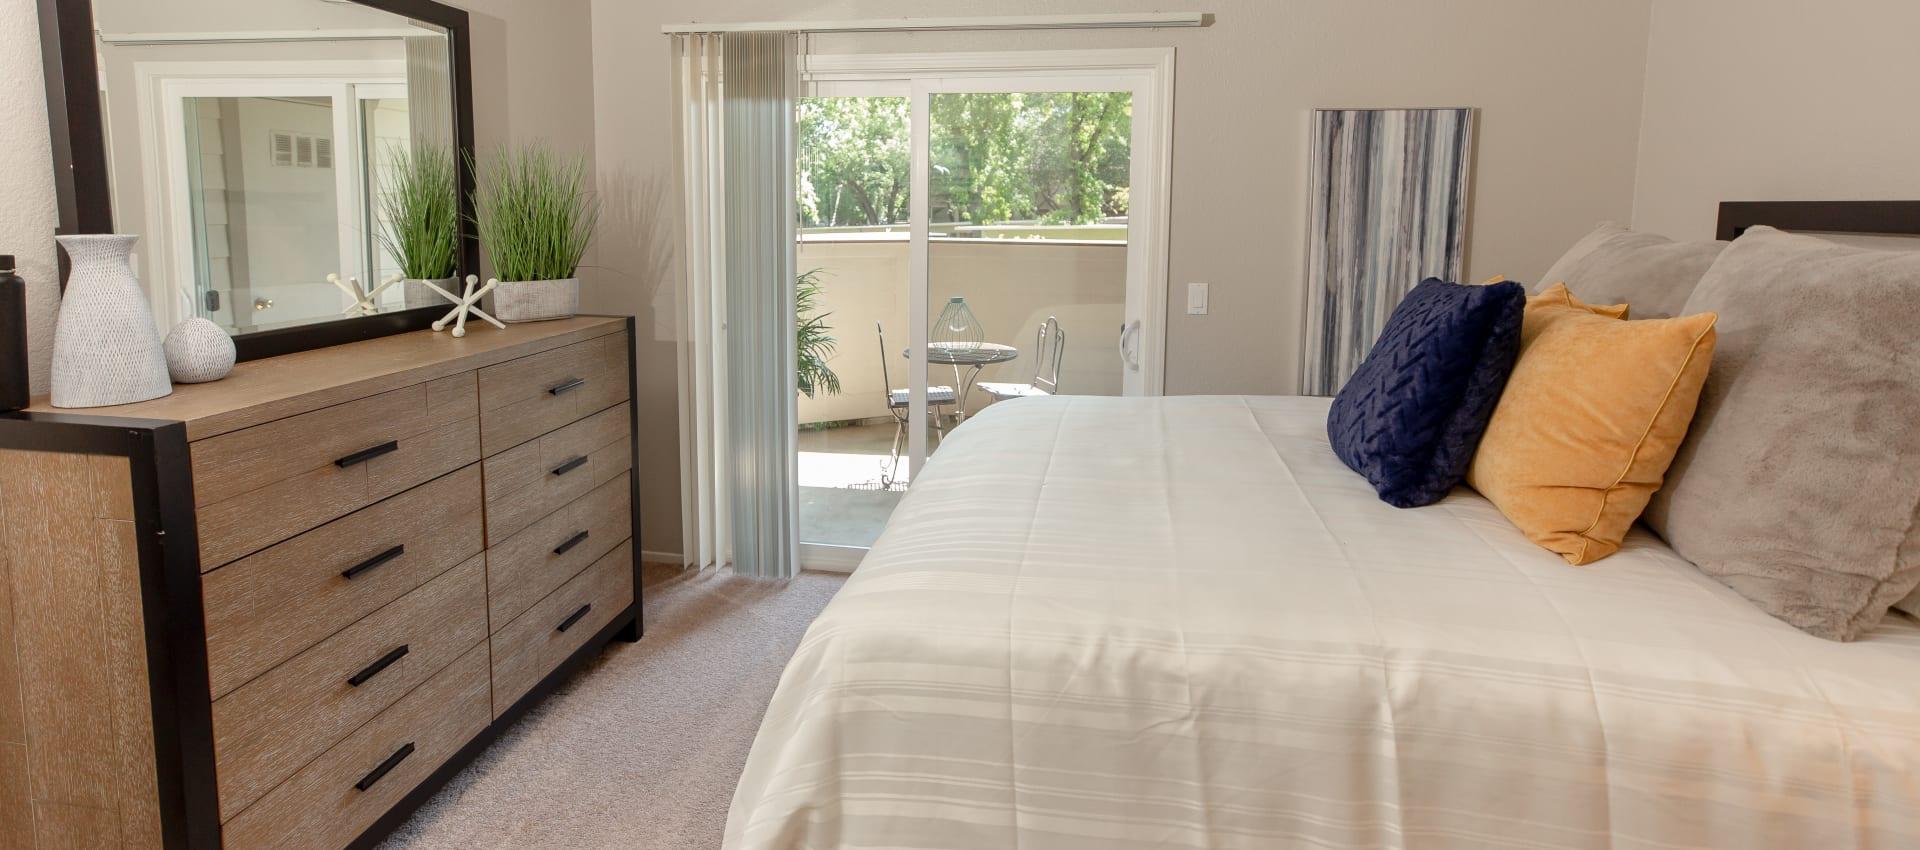 Bedroom at Shaliko in Rocklin, California.